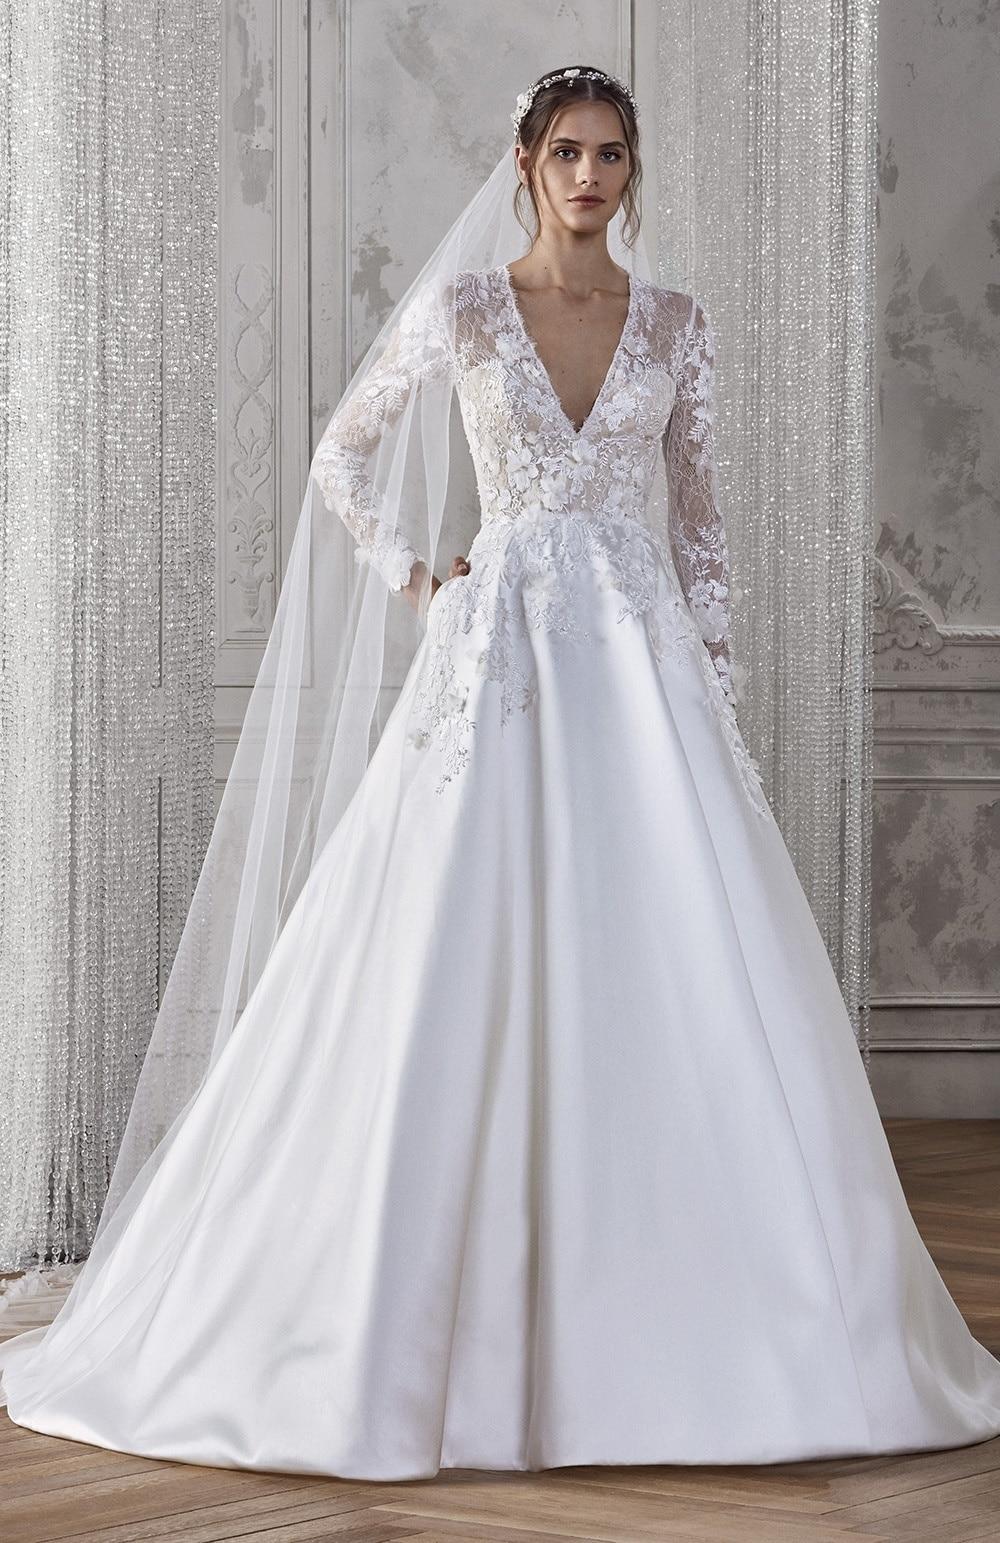 Robe de mariée Modèle Kasmira